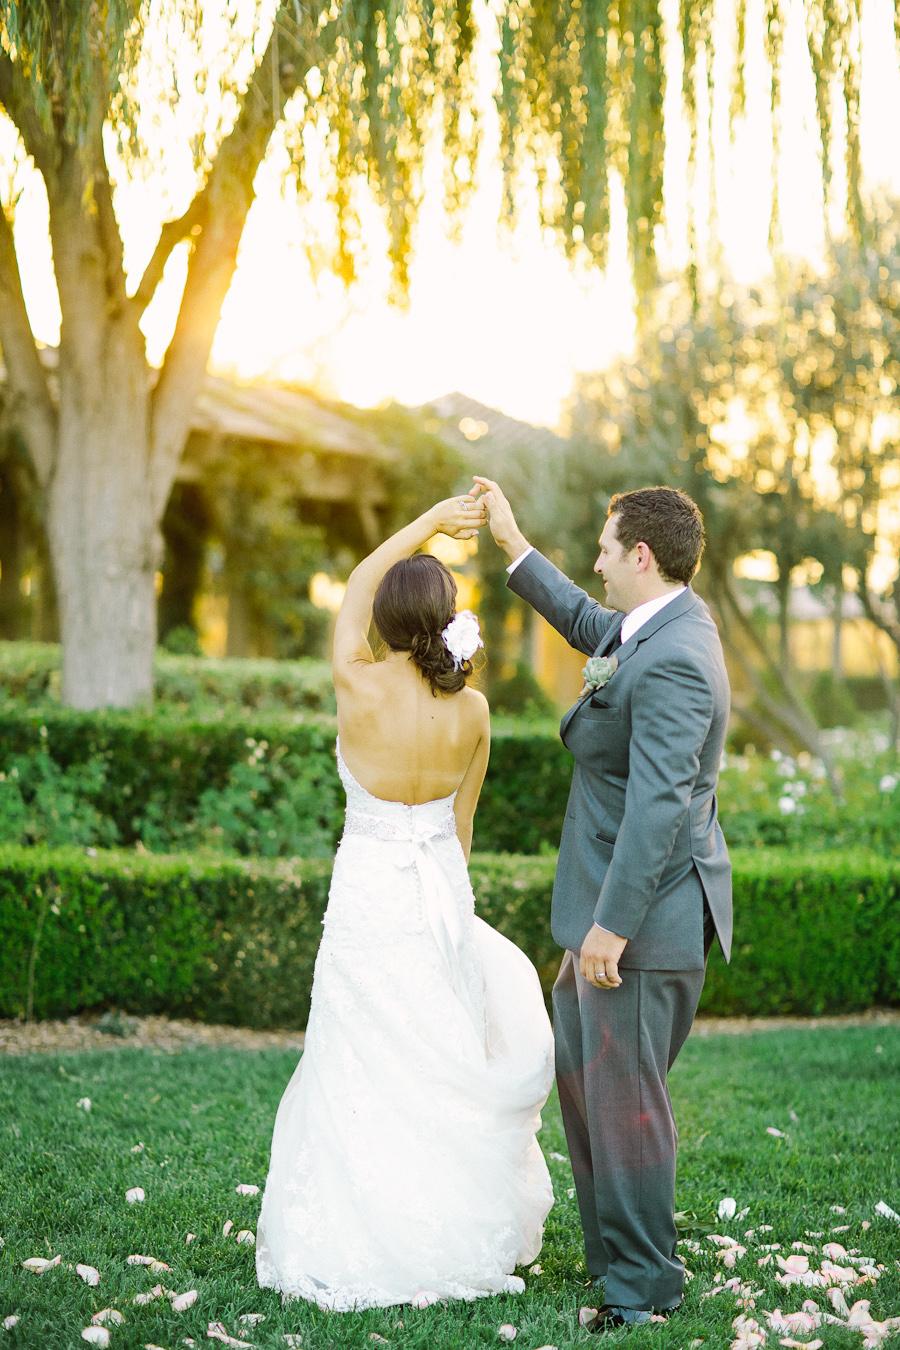 southern california fine art wedding photographer, ponte winery wedding, vineyard wedding, winery wedding, temecula wedding, glowy wedding photography, fine art photography